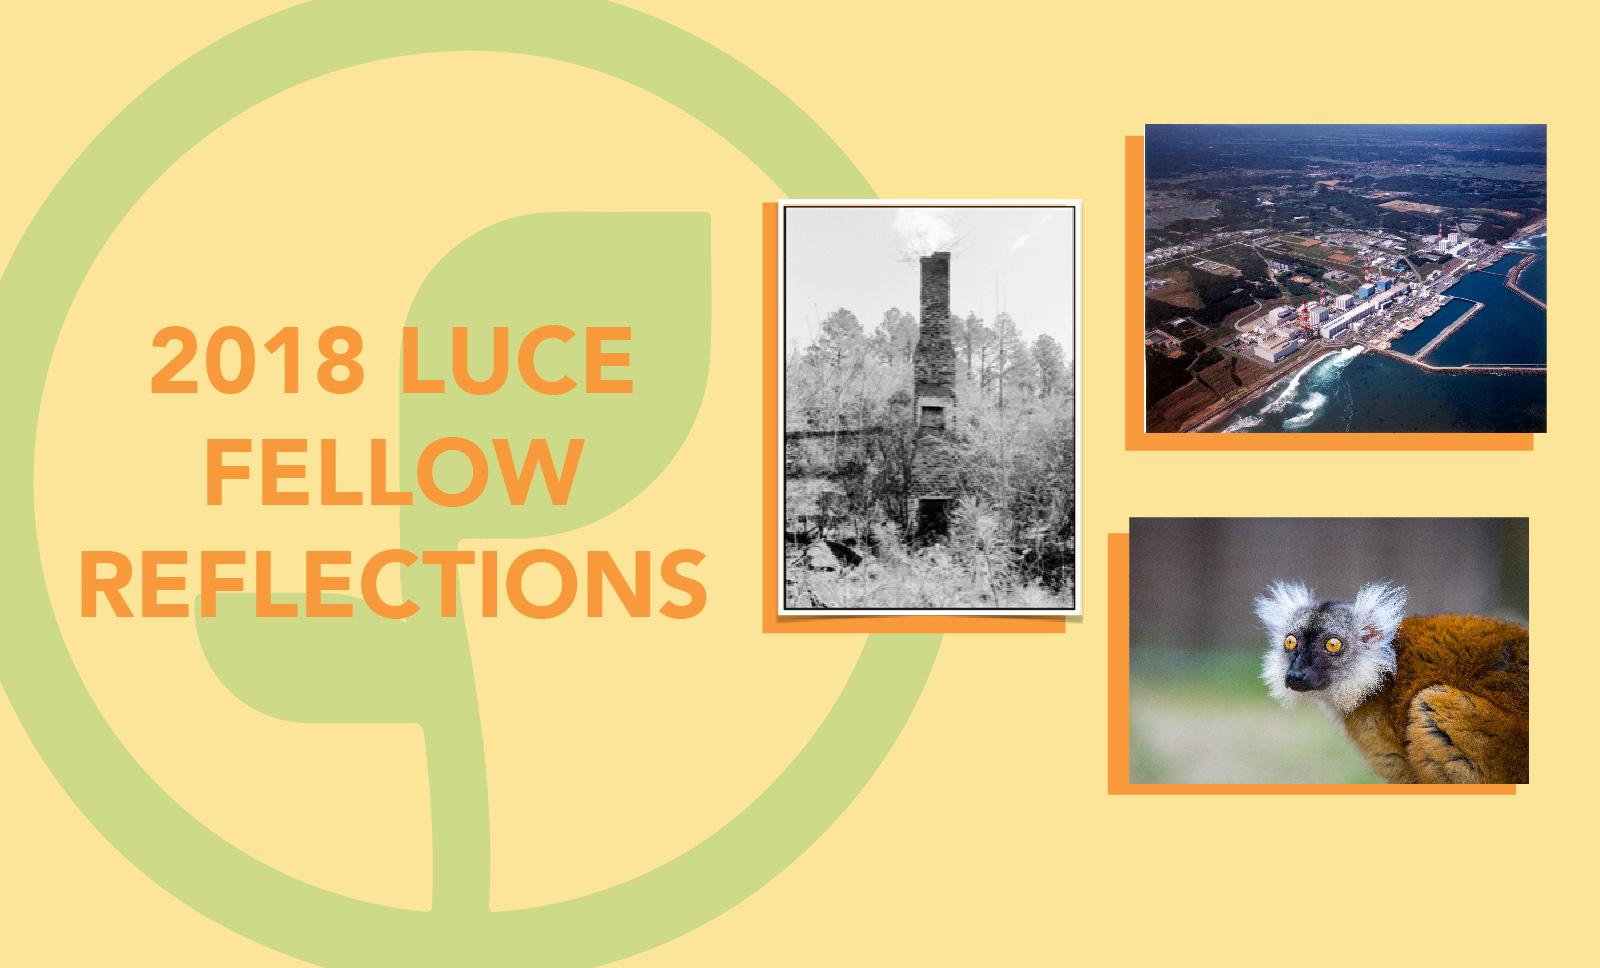 luceFellowReflections2018Slider-01